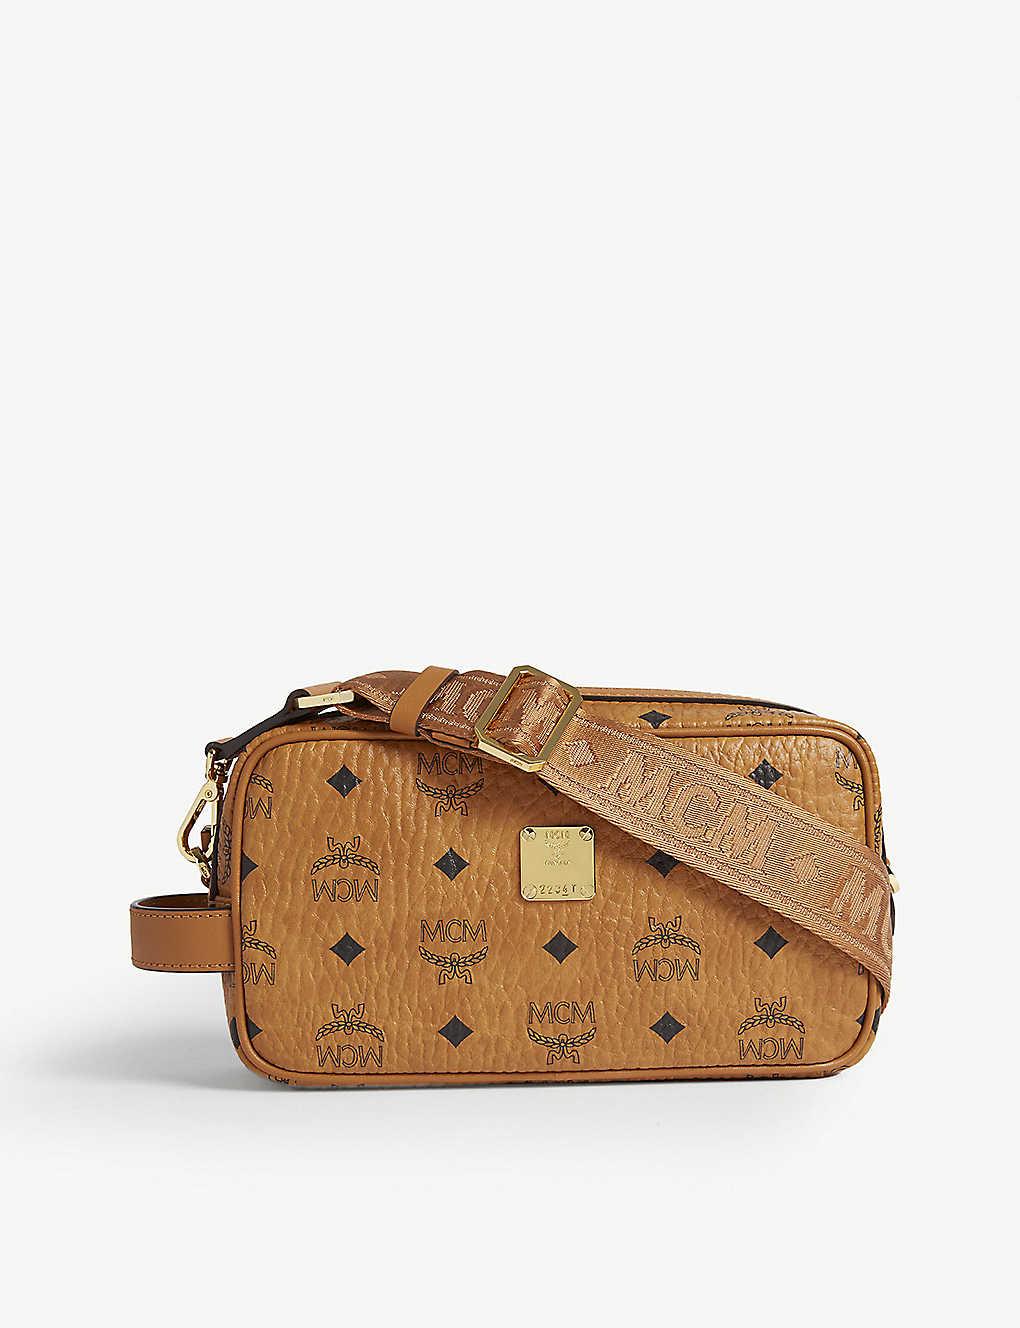 07a61baf1 MCM - Visetos coated canvas cross body bag | Selfridges.com